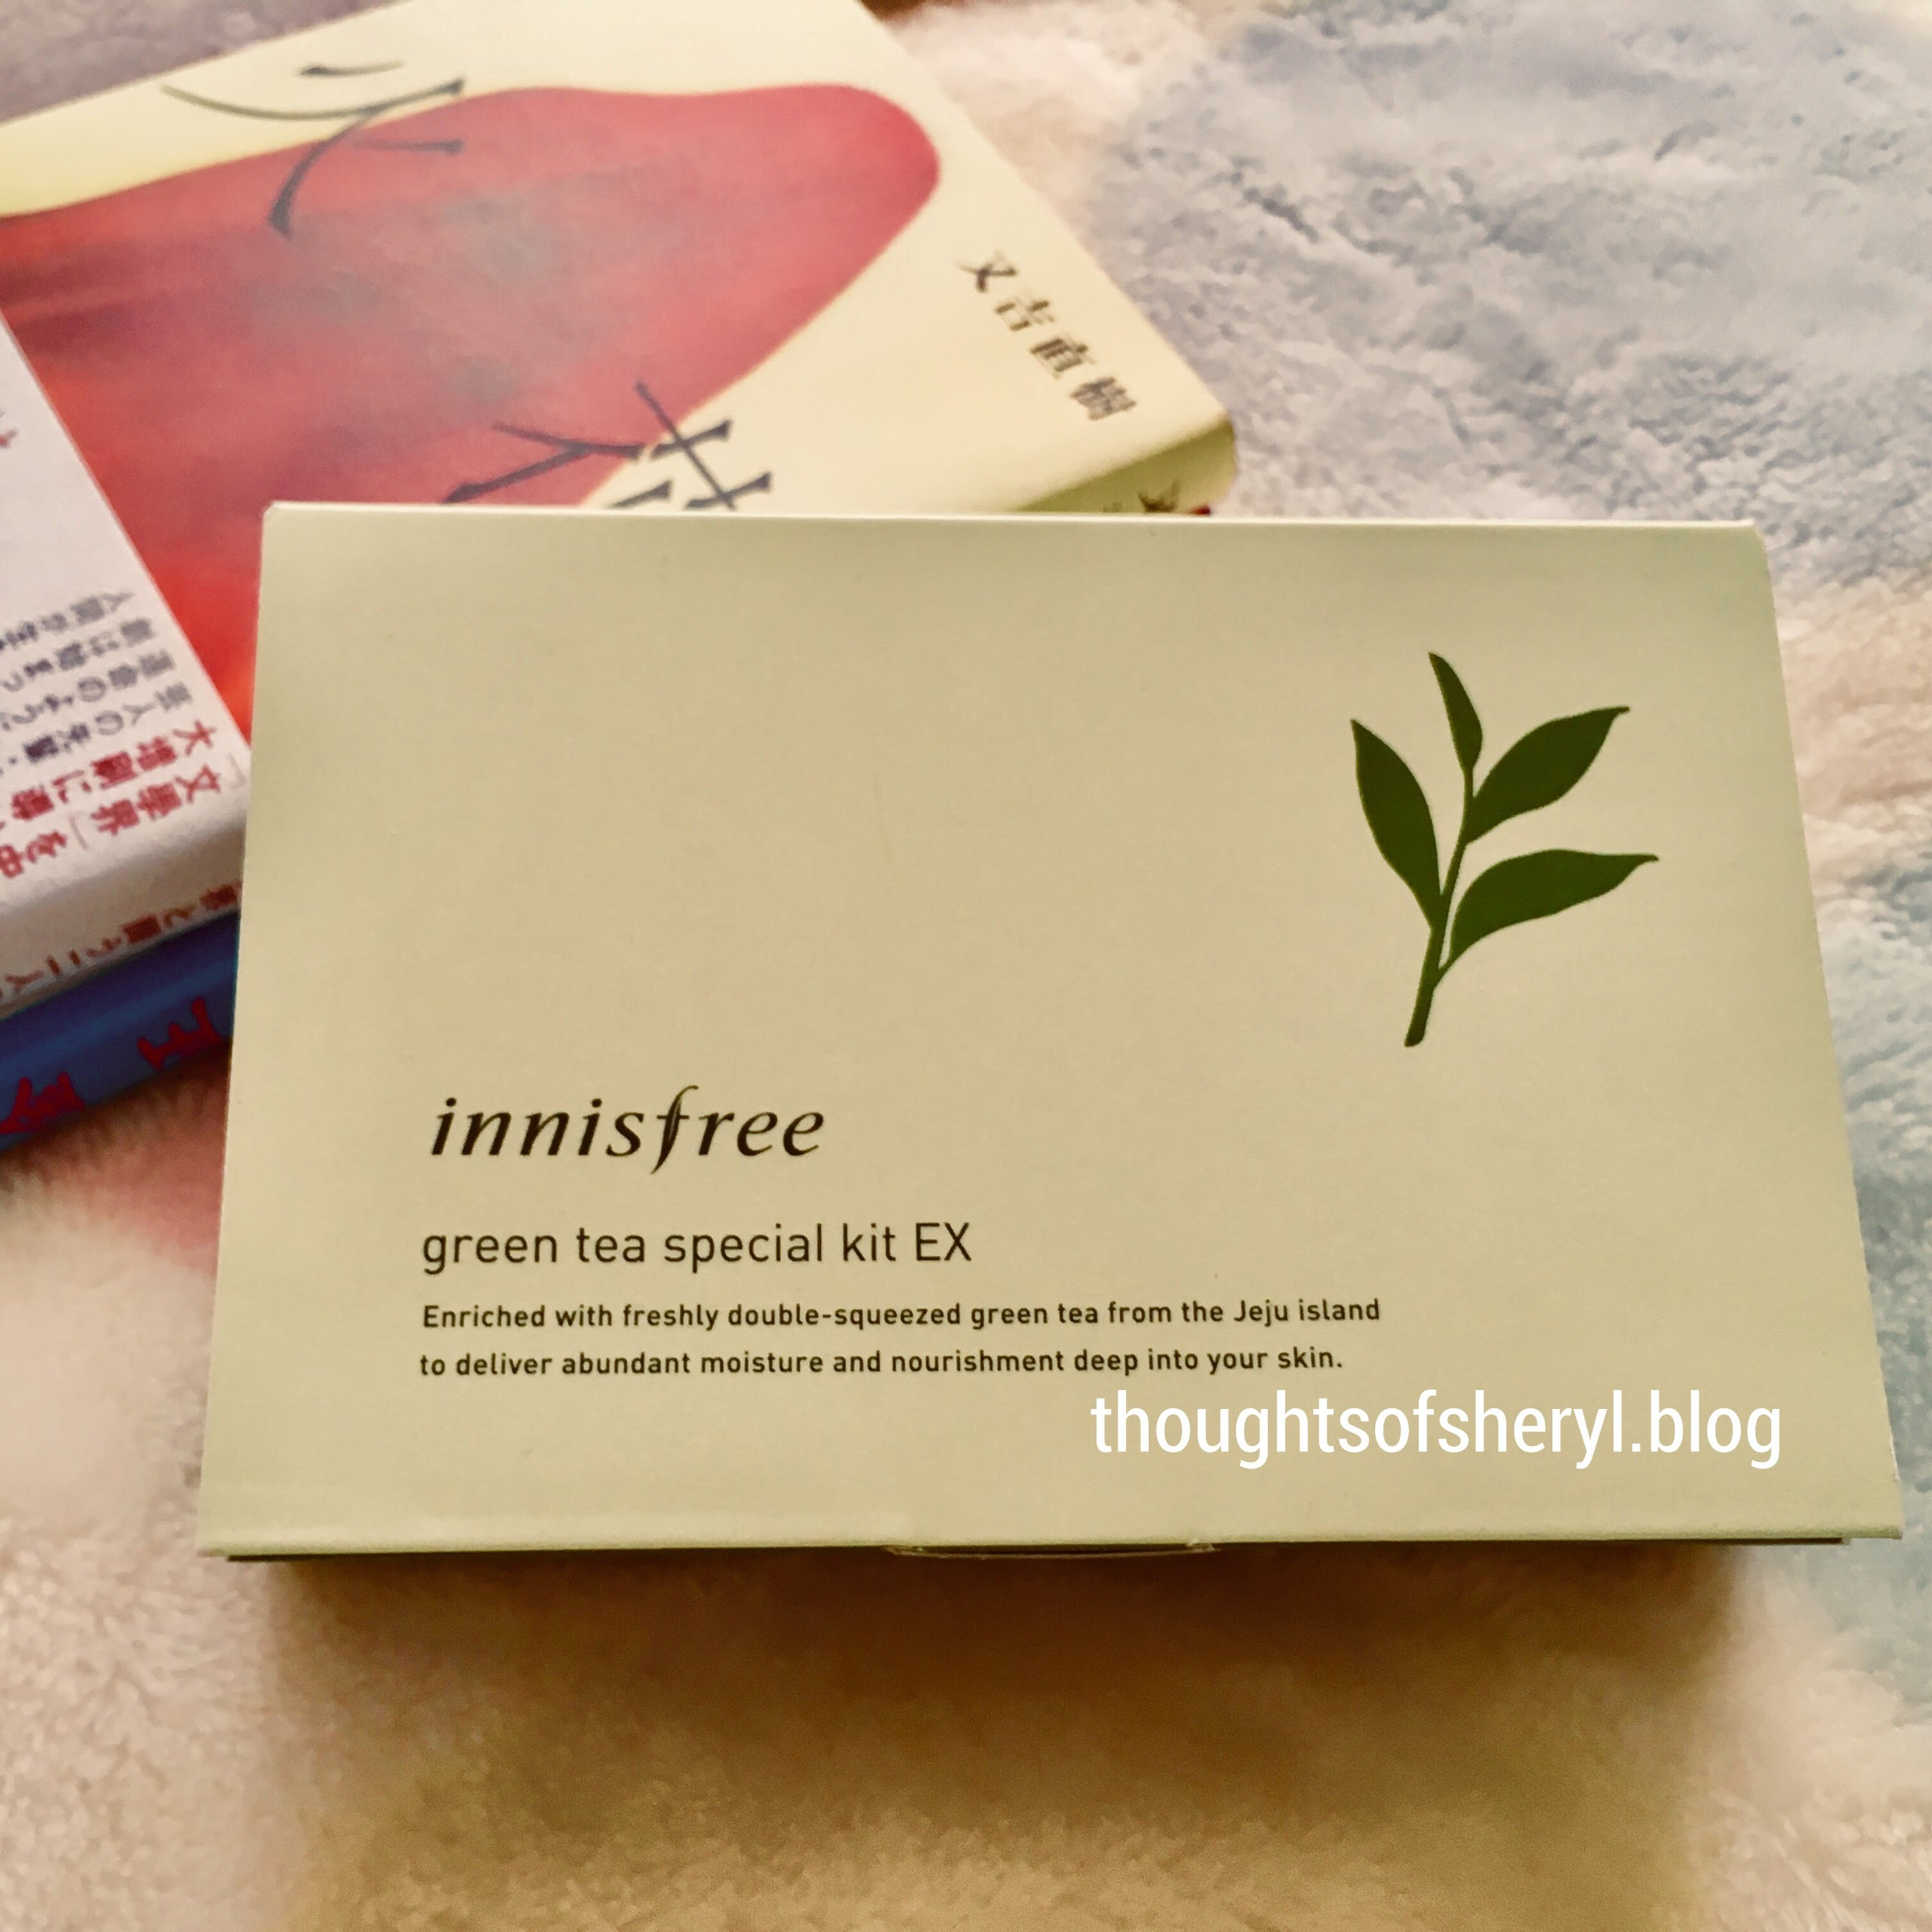 innisfree green tea special kit ex review